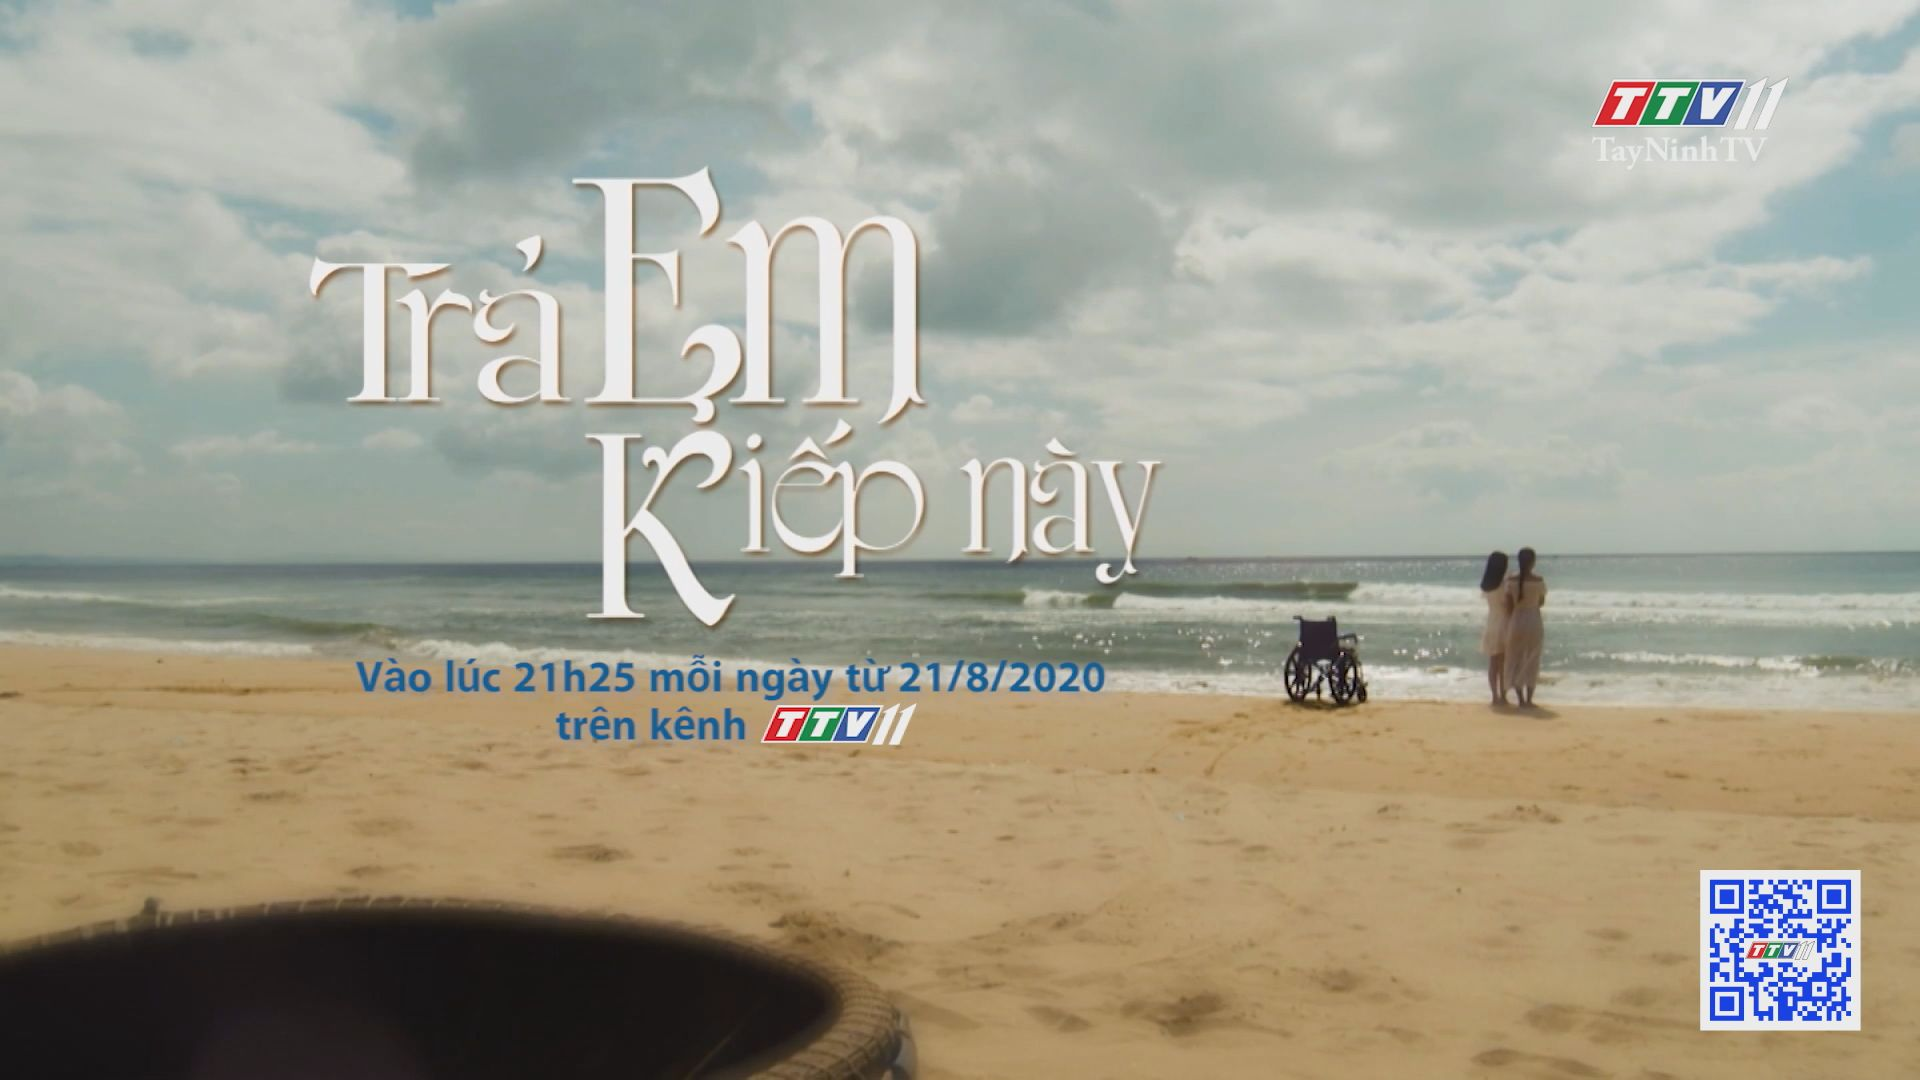 Phim TRẢ EM KIẾP NÀY-Trailer   TayNinhTV